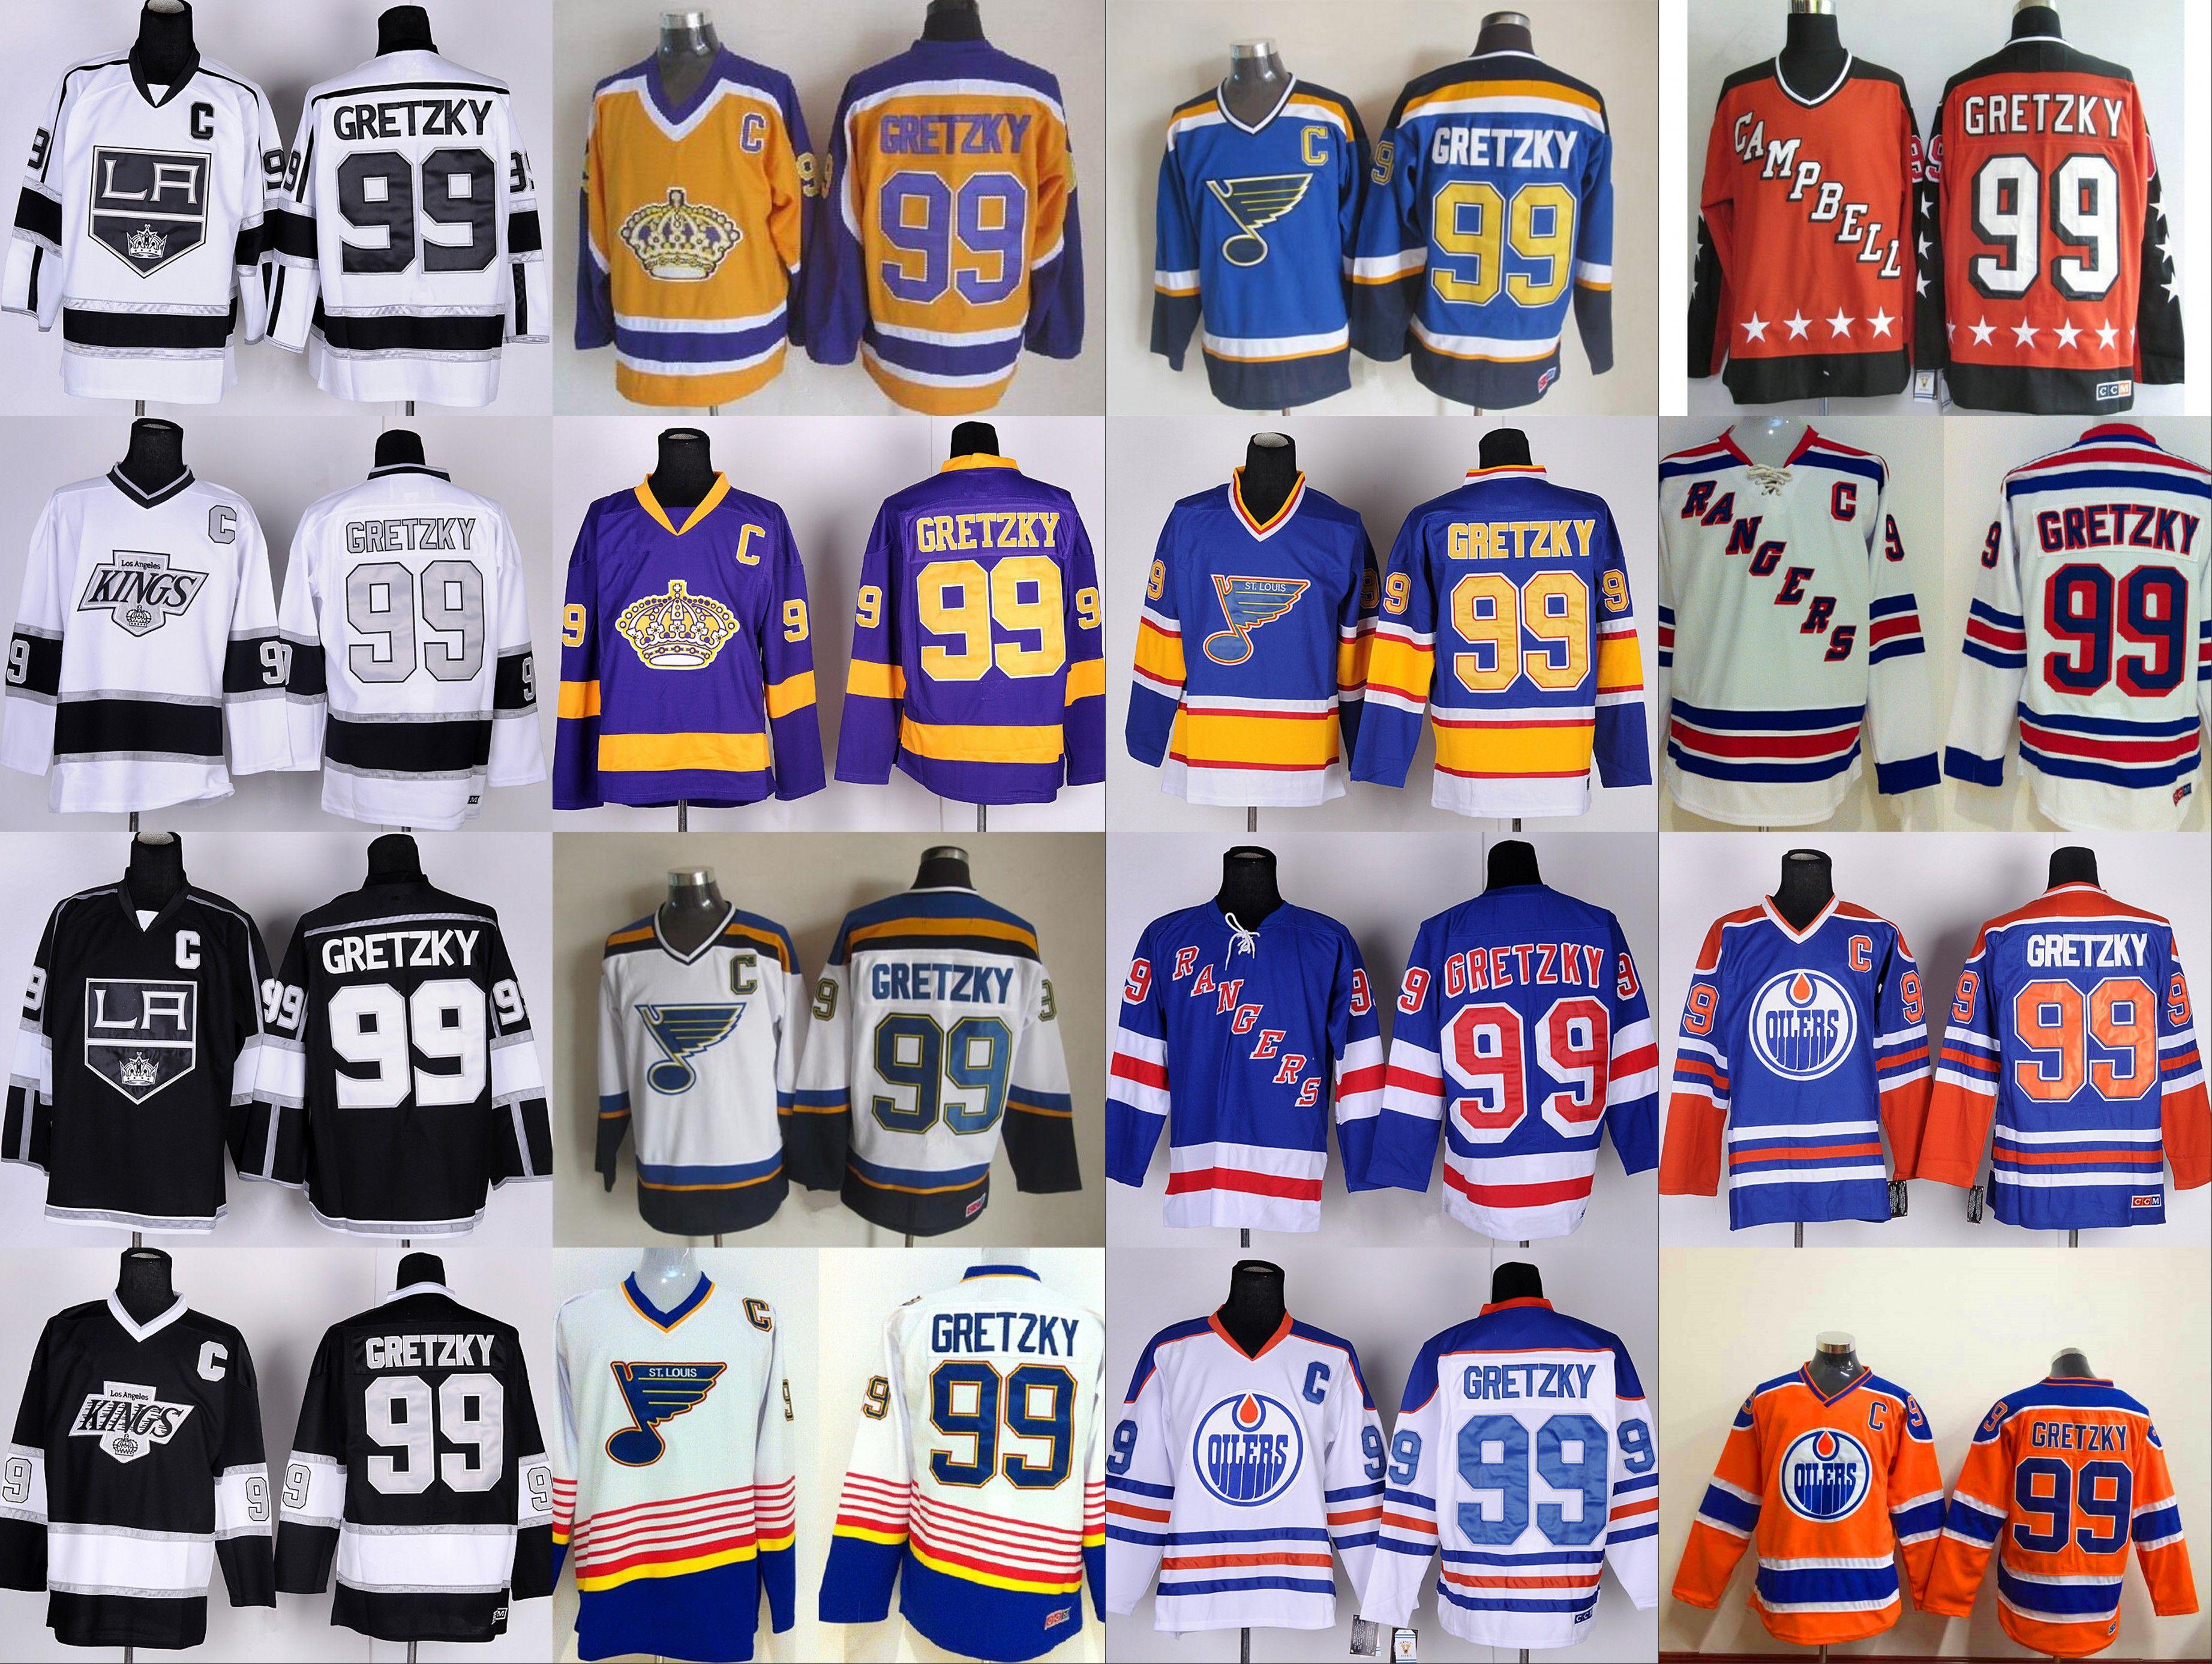 Wayne Gretzky Jerseys Hockey St. Louis